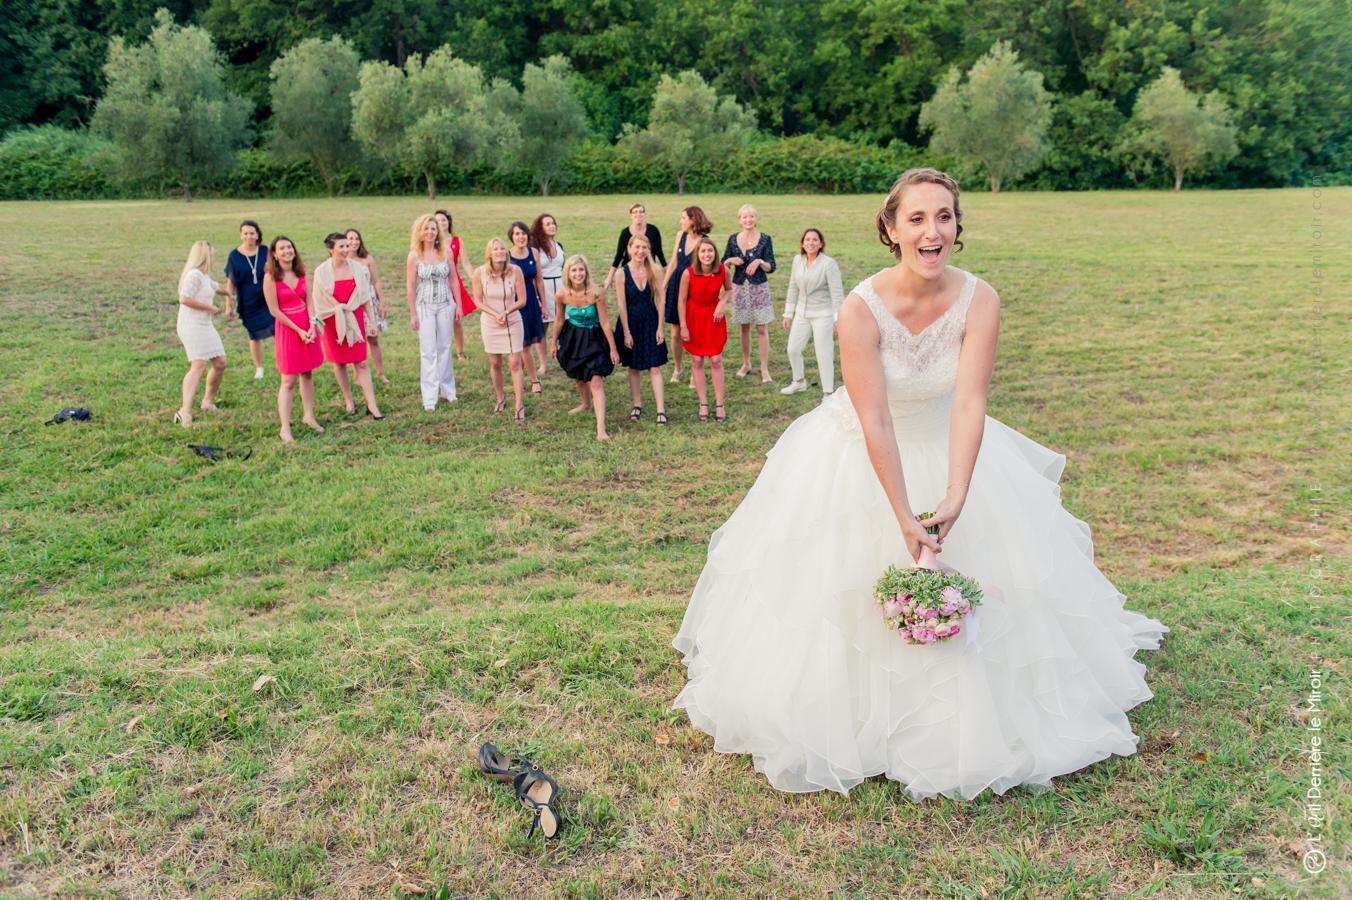 mariage-cj-vaugrenier-loeilderrierelemiroir-065